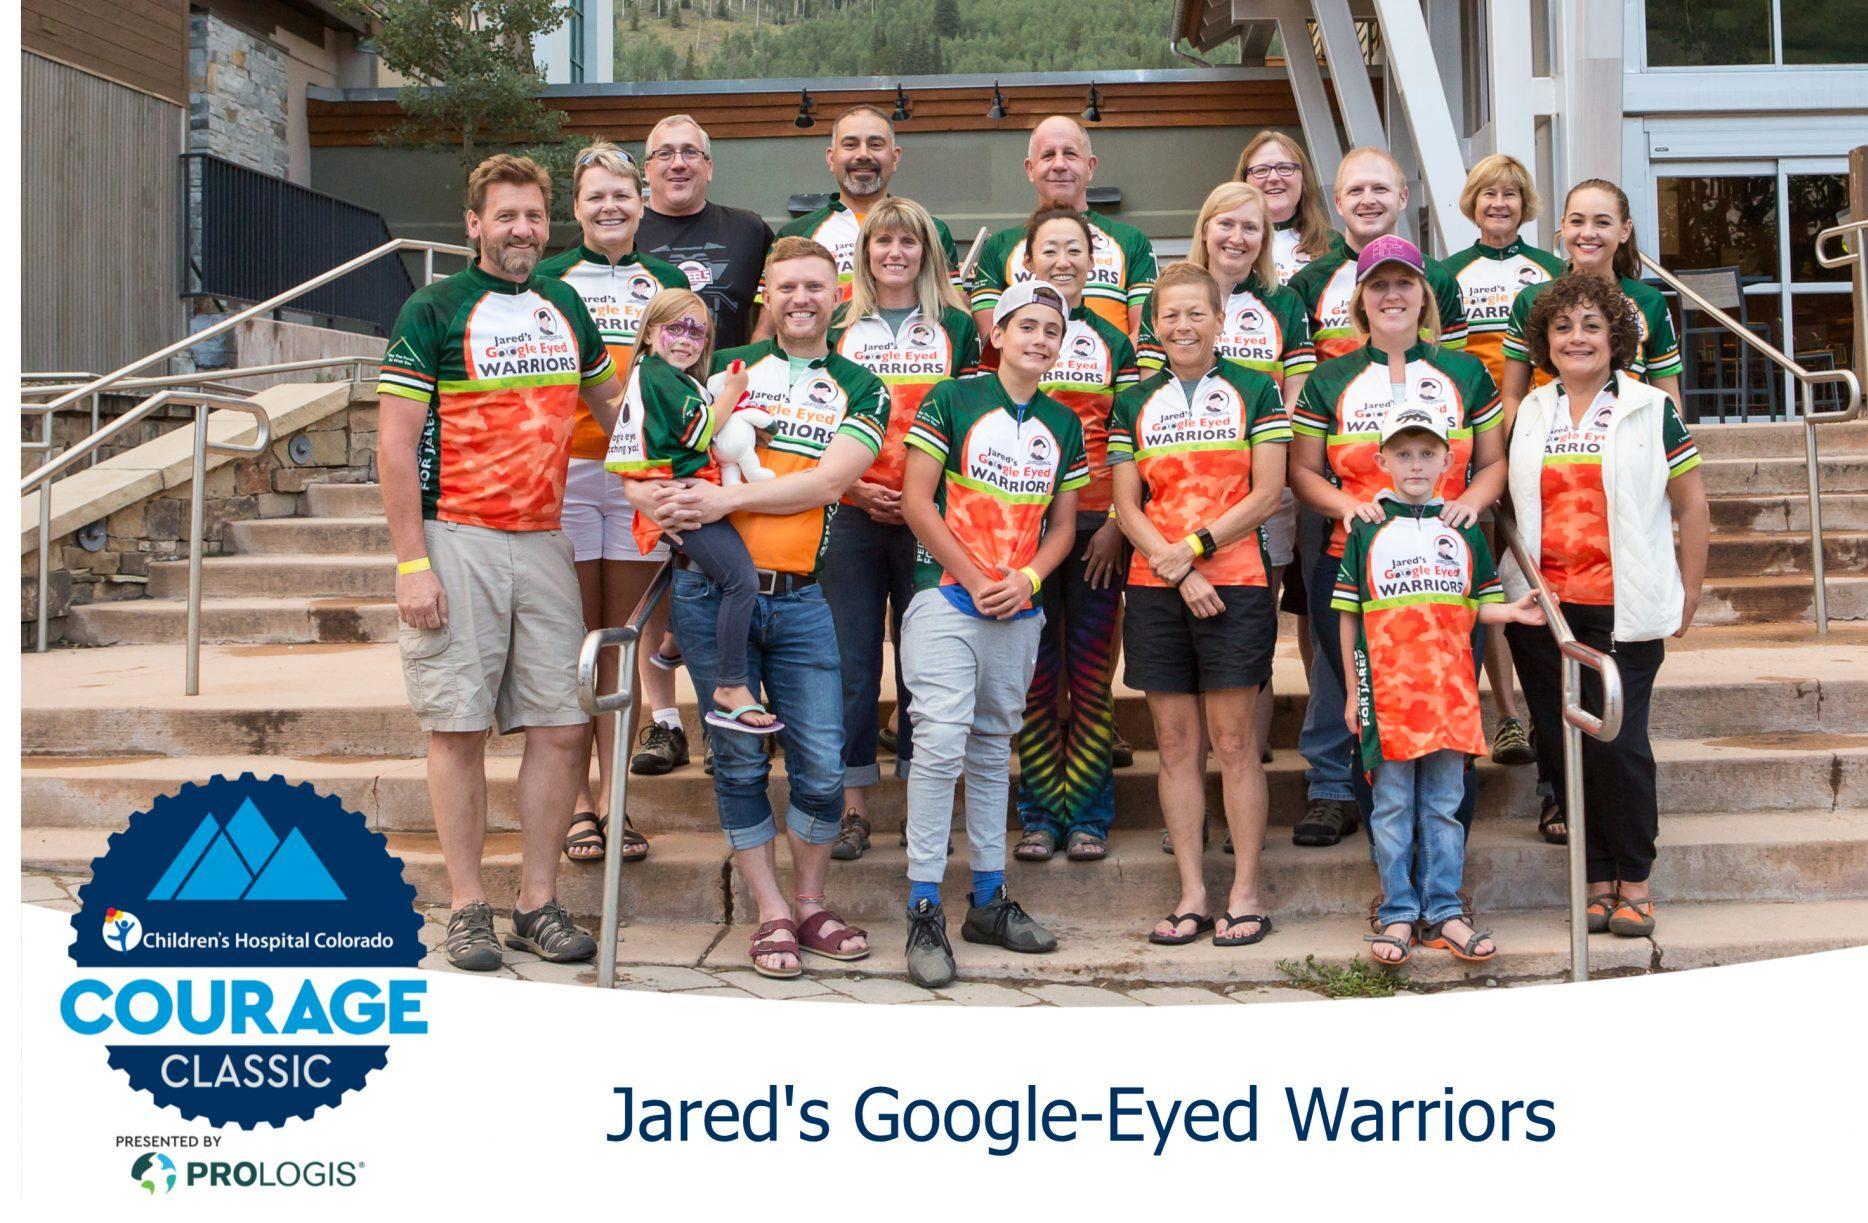 JARED'S GOOGLE EYED WARRIORS